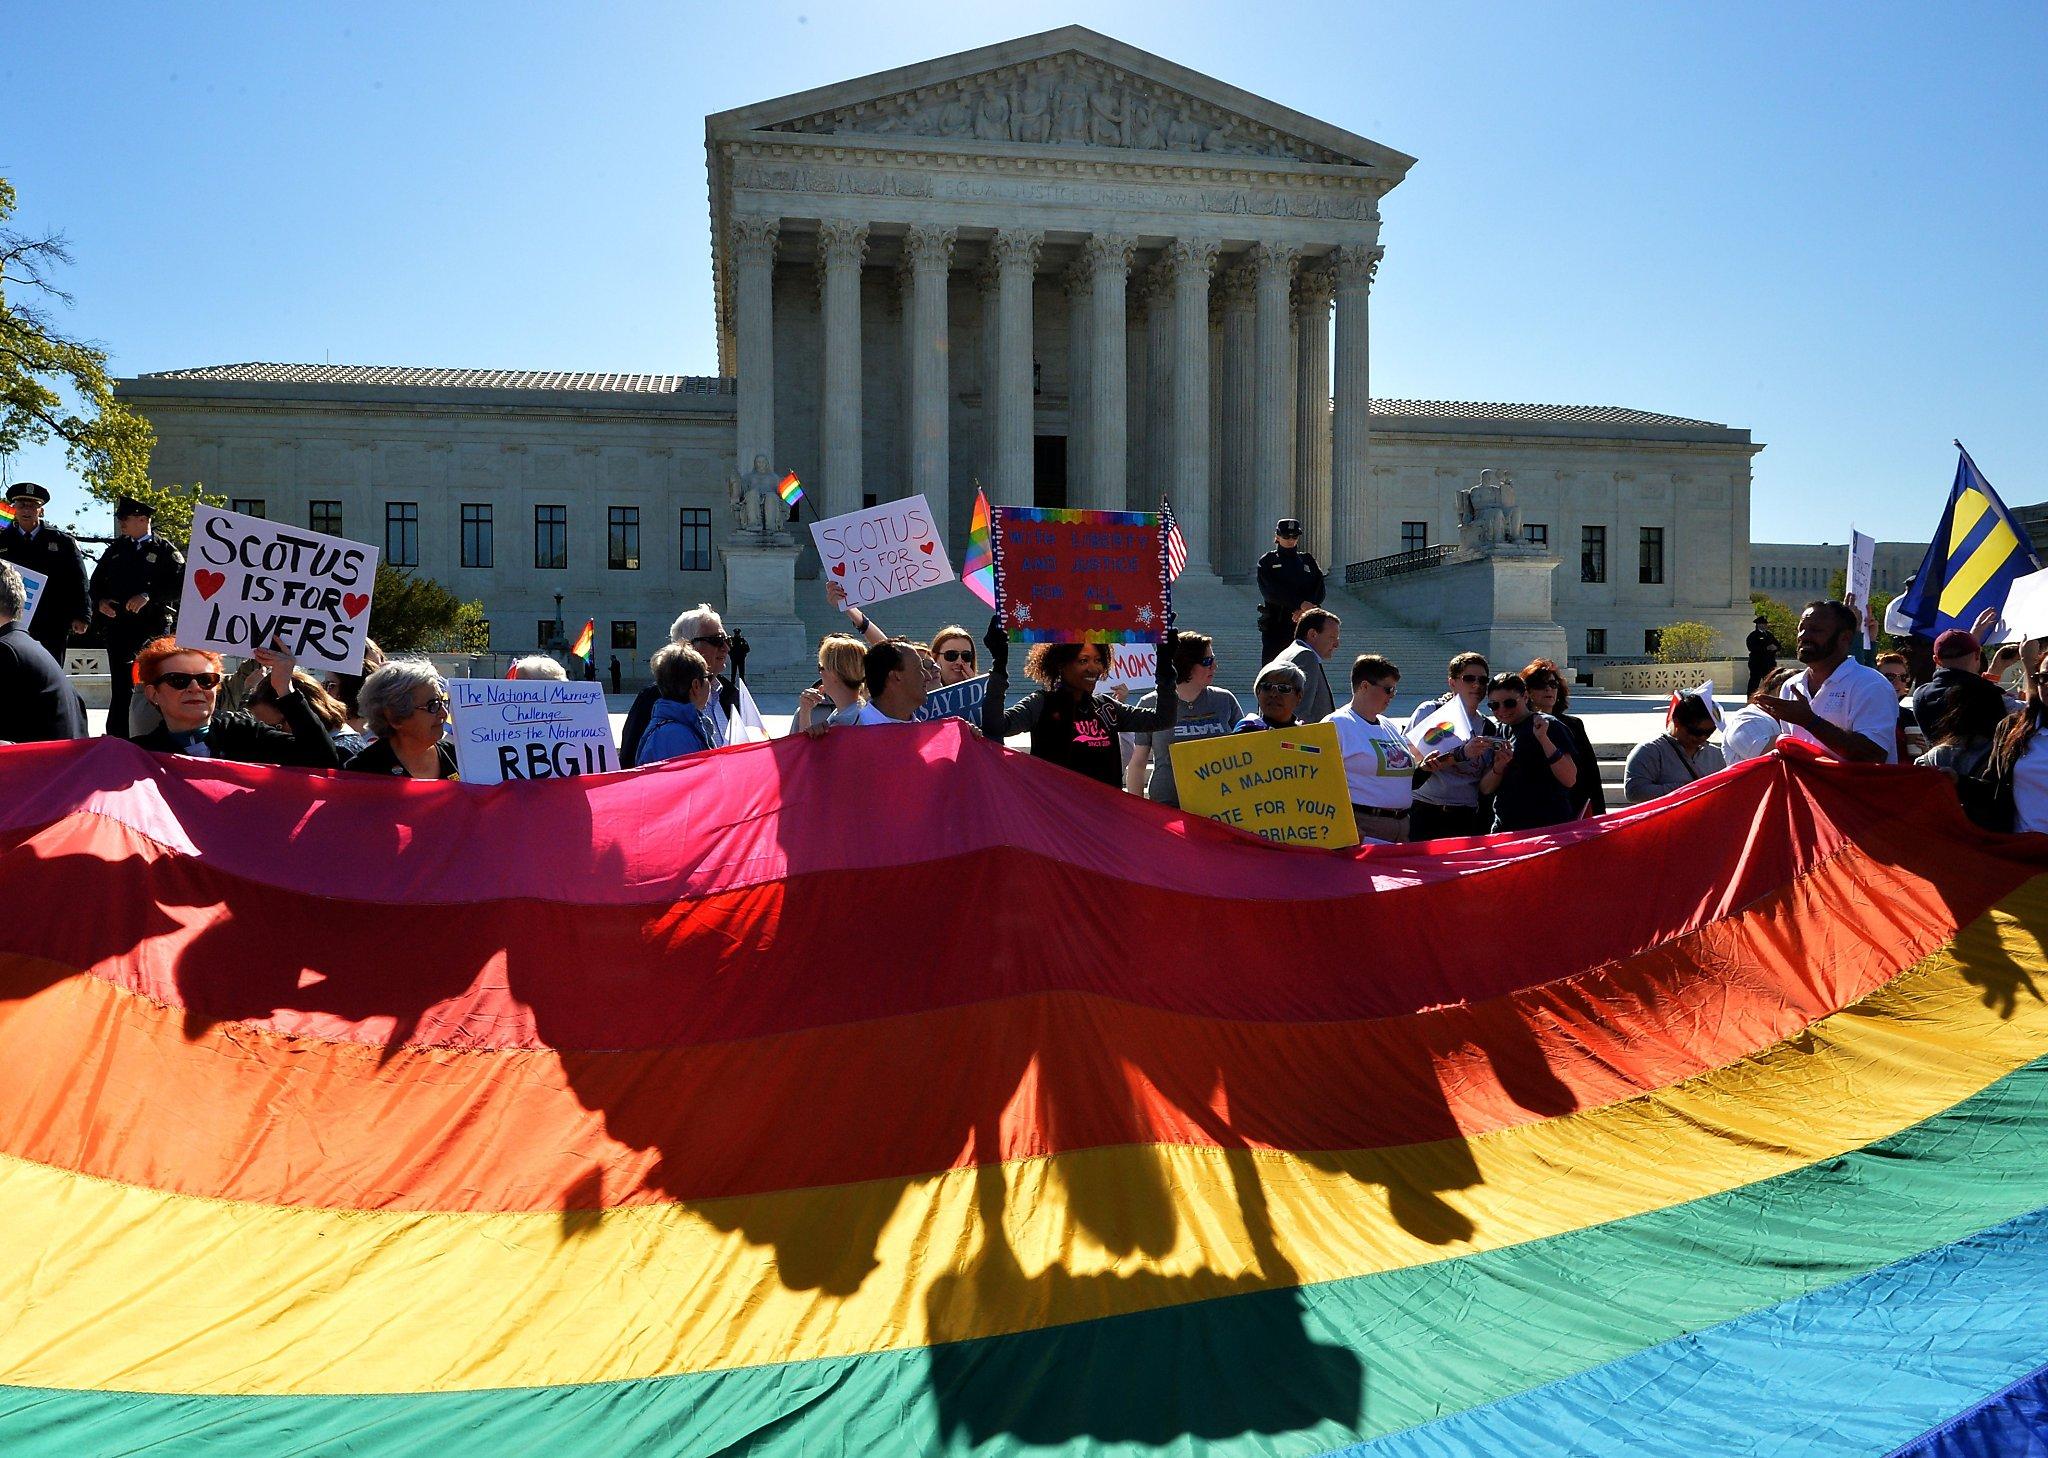 Kentucky supreme court dismisses gay pride